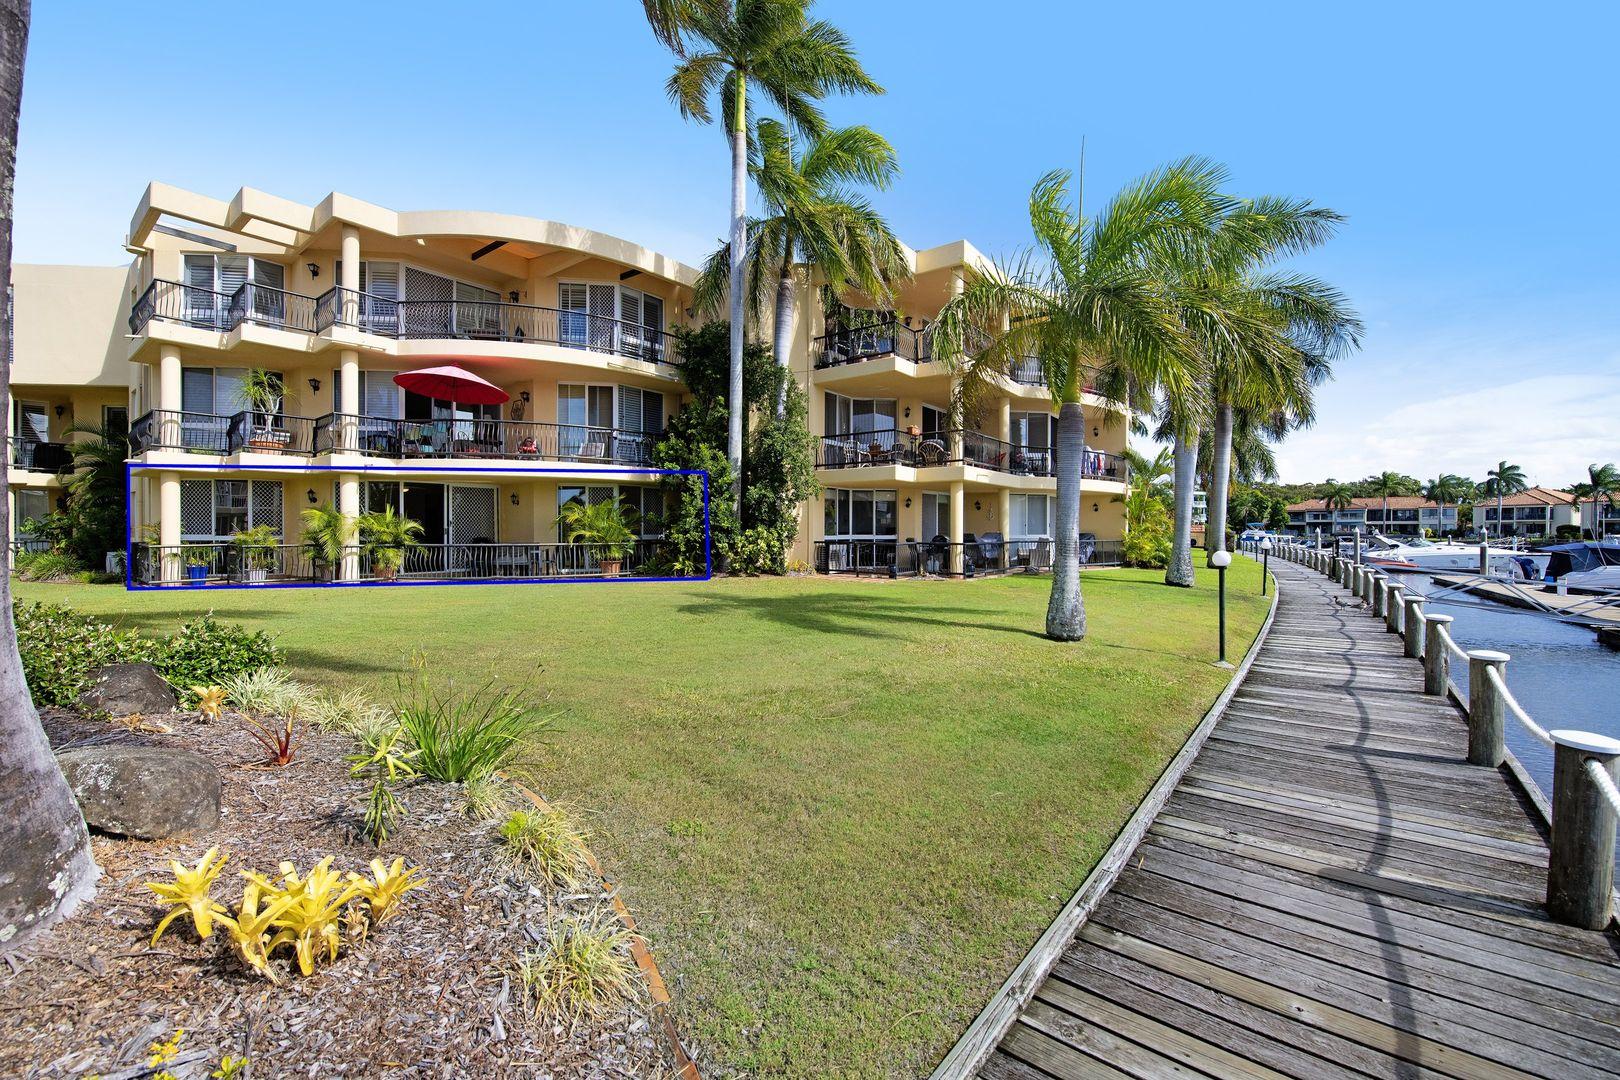 14/41A Broadwater Street, Runaway Bay QLD 4216, Image 1